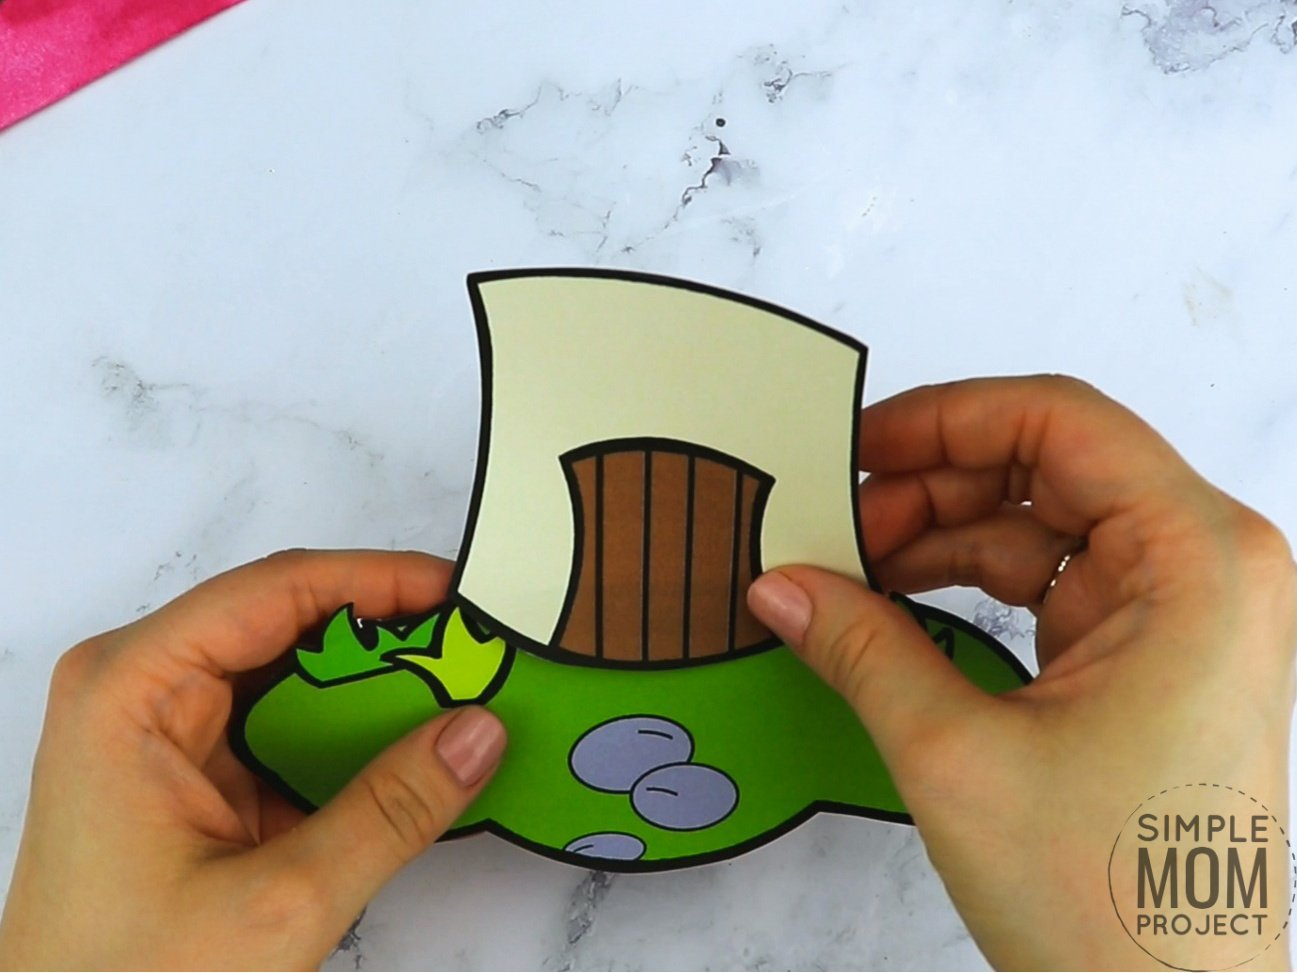 Free printable mushroom coloring page template for kids, preschoolers and kindergartners